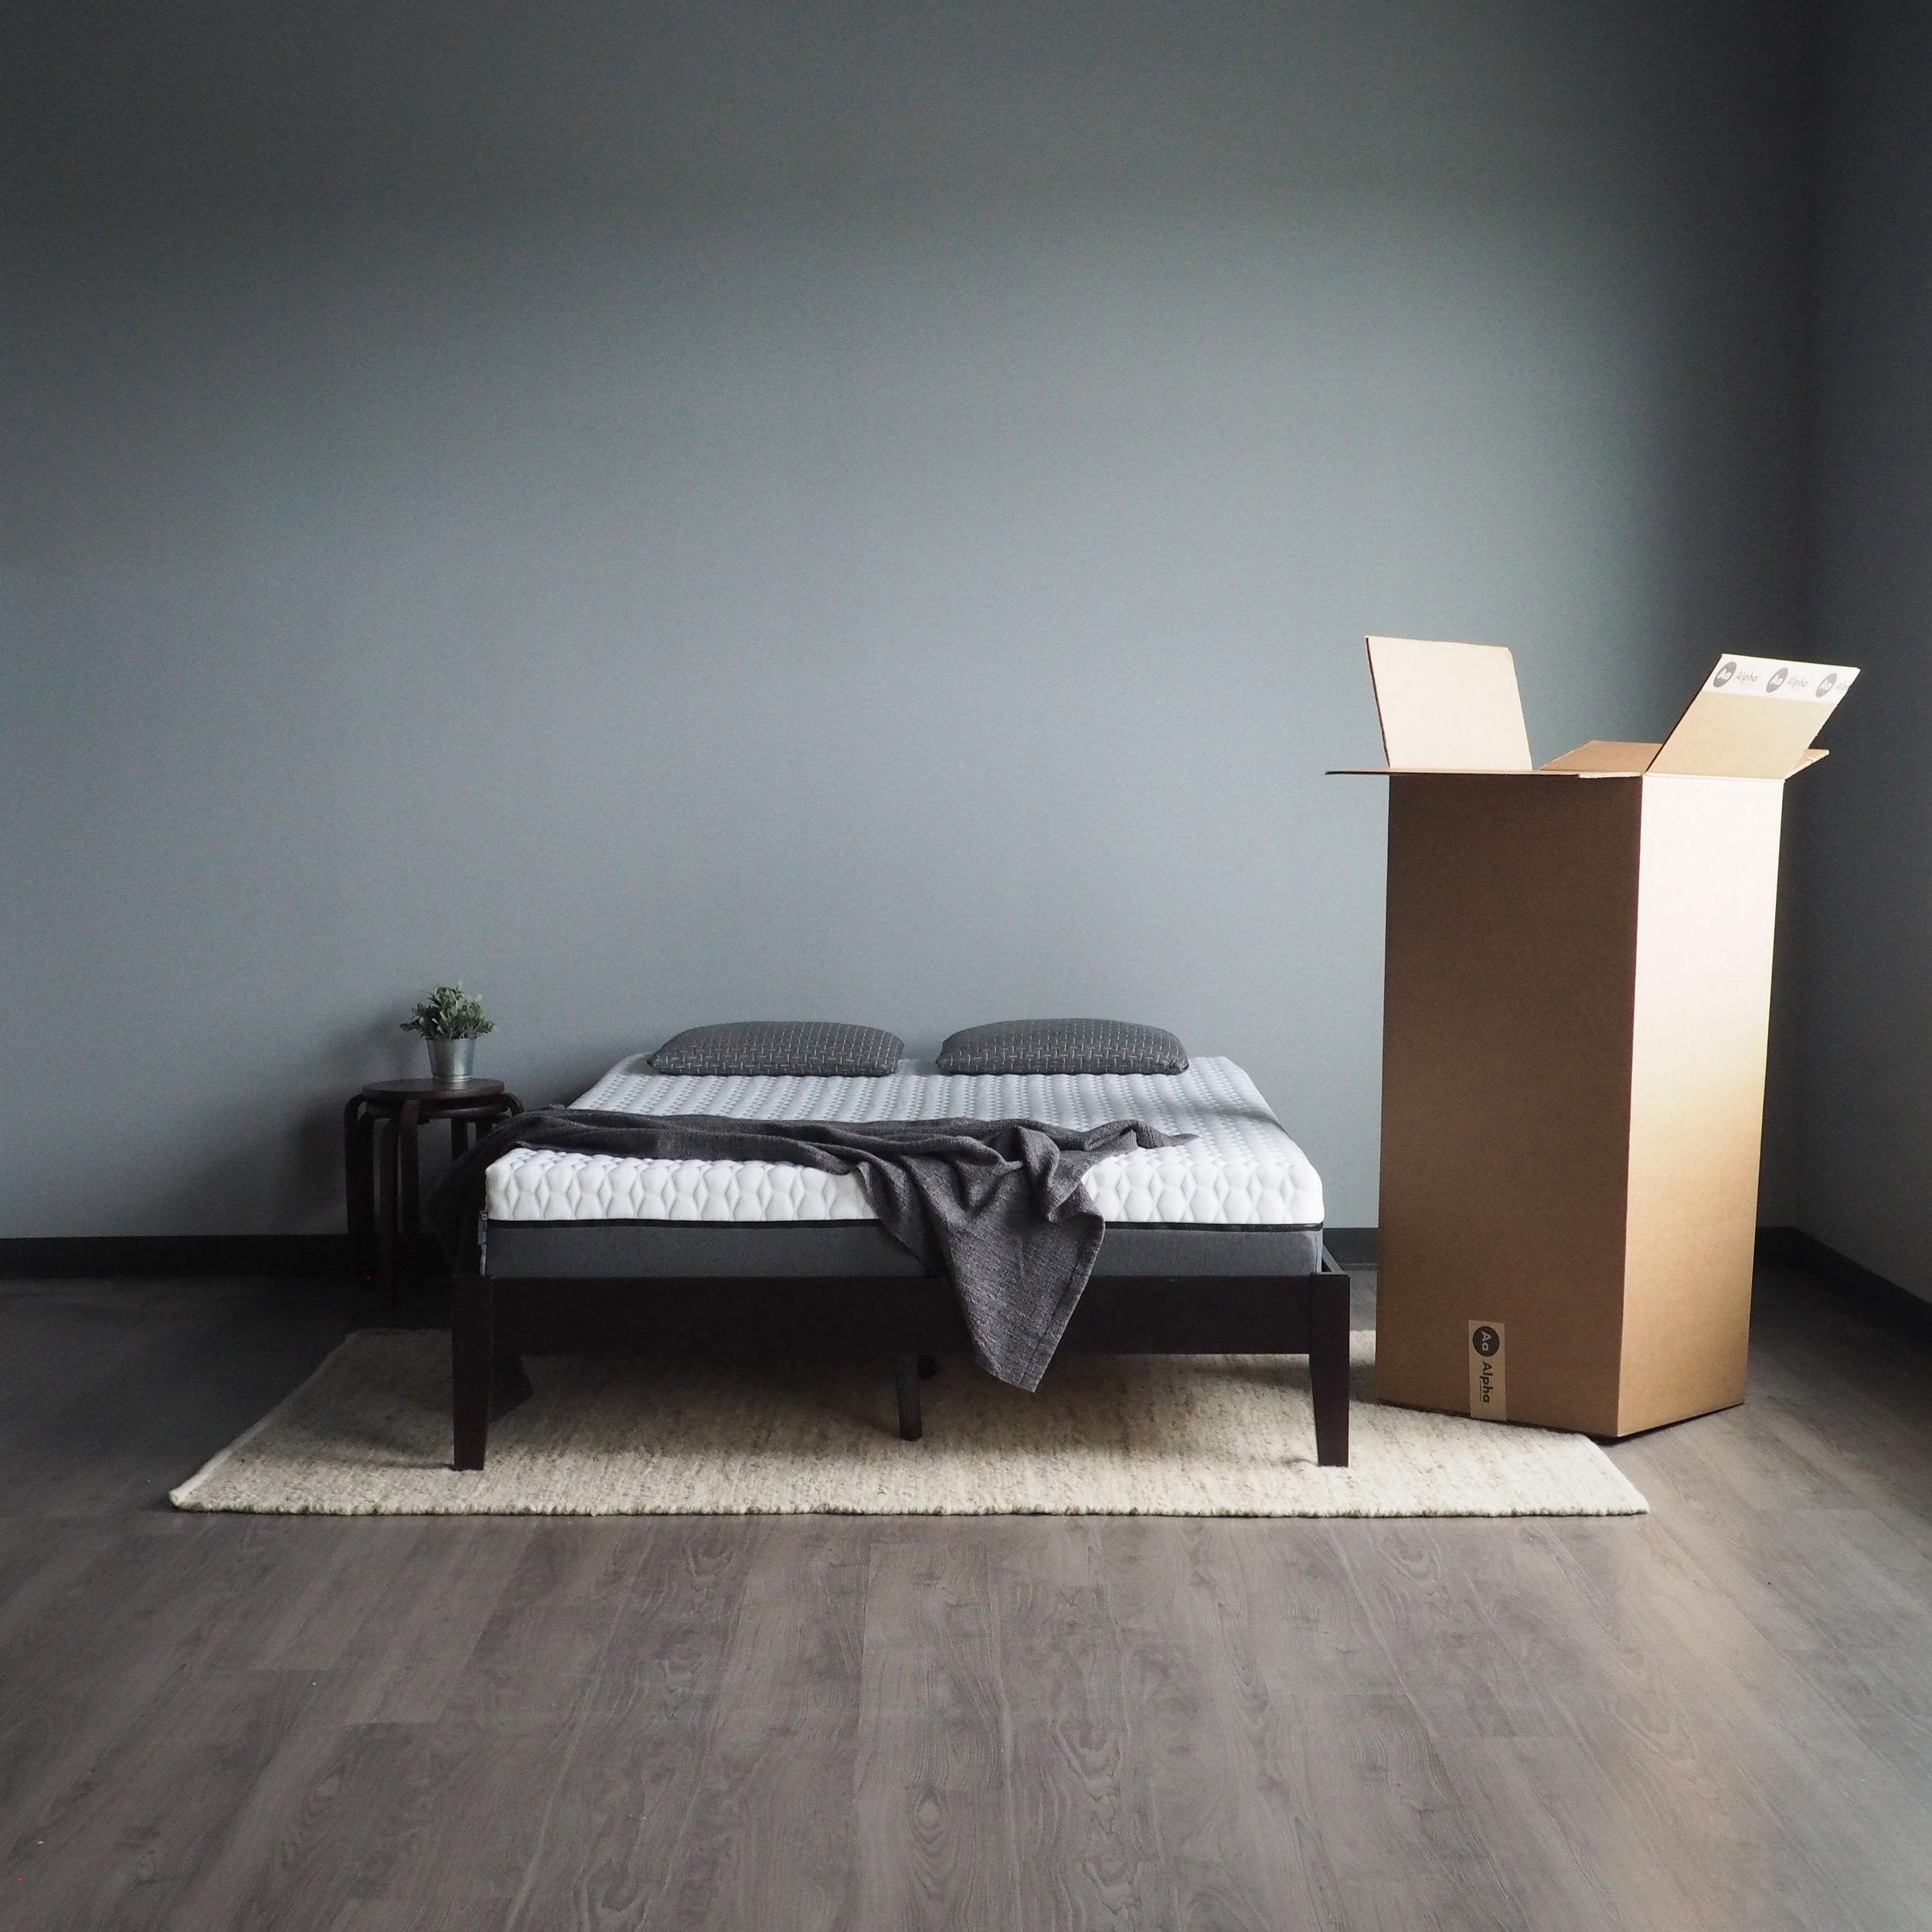 Alpha-Mattress-Pressure-Relief-Bed-in-a-box.jpg